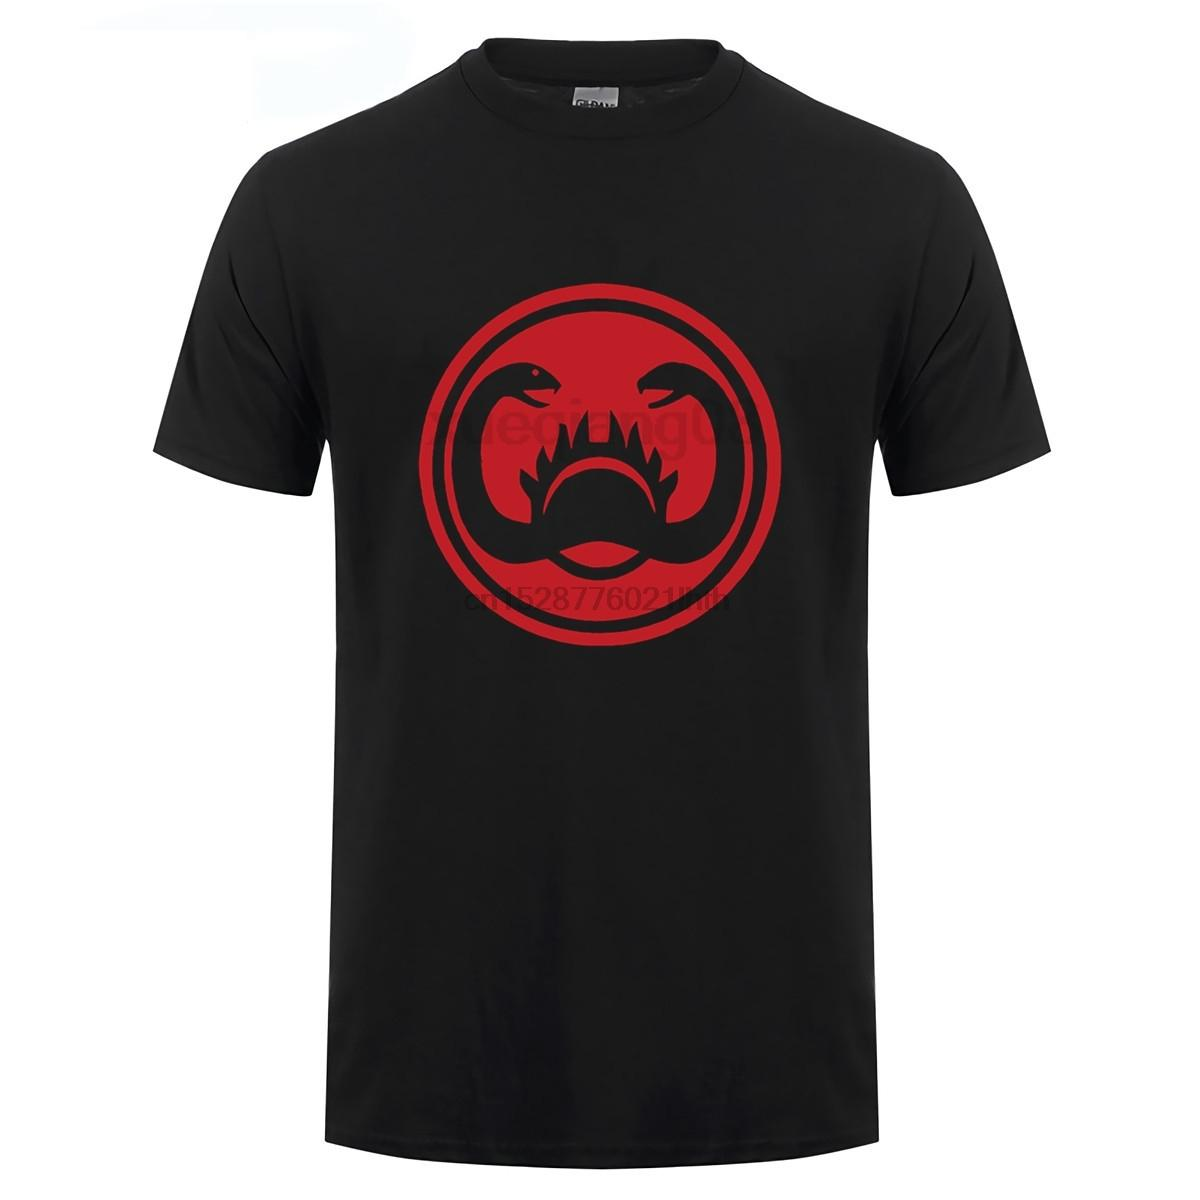 Conan The Barbarian Thulsa Doom Men Camiseta